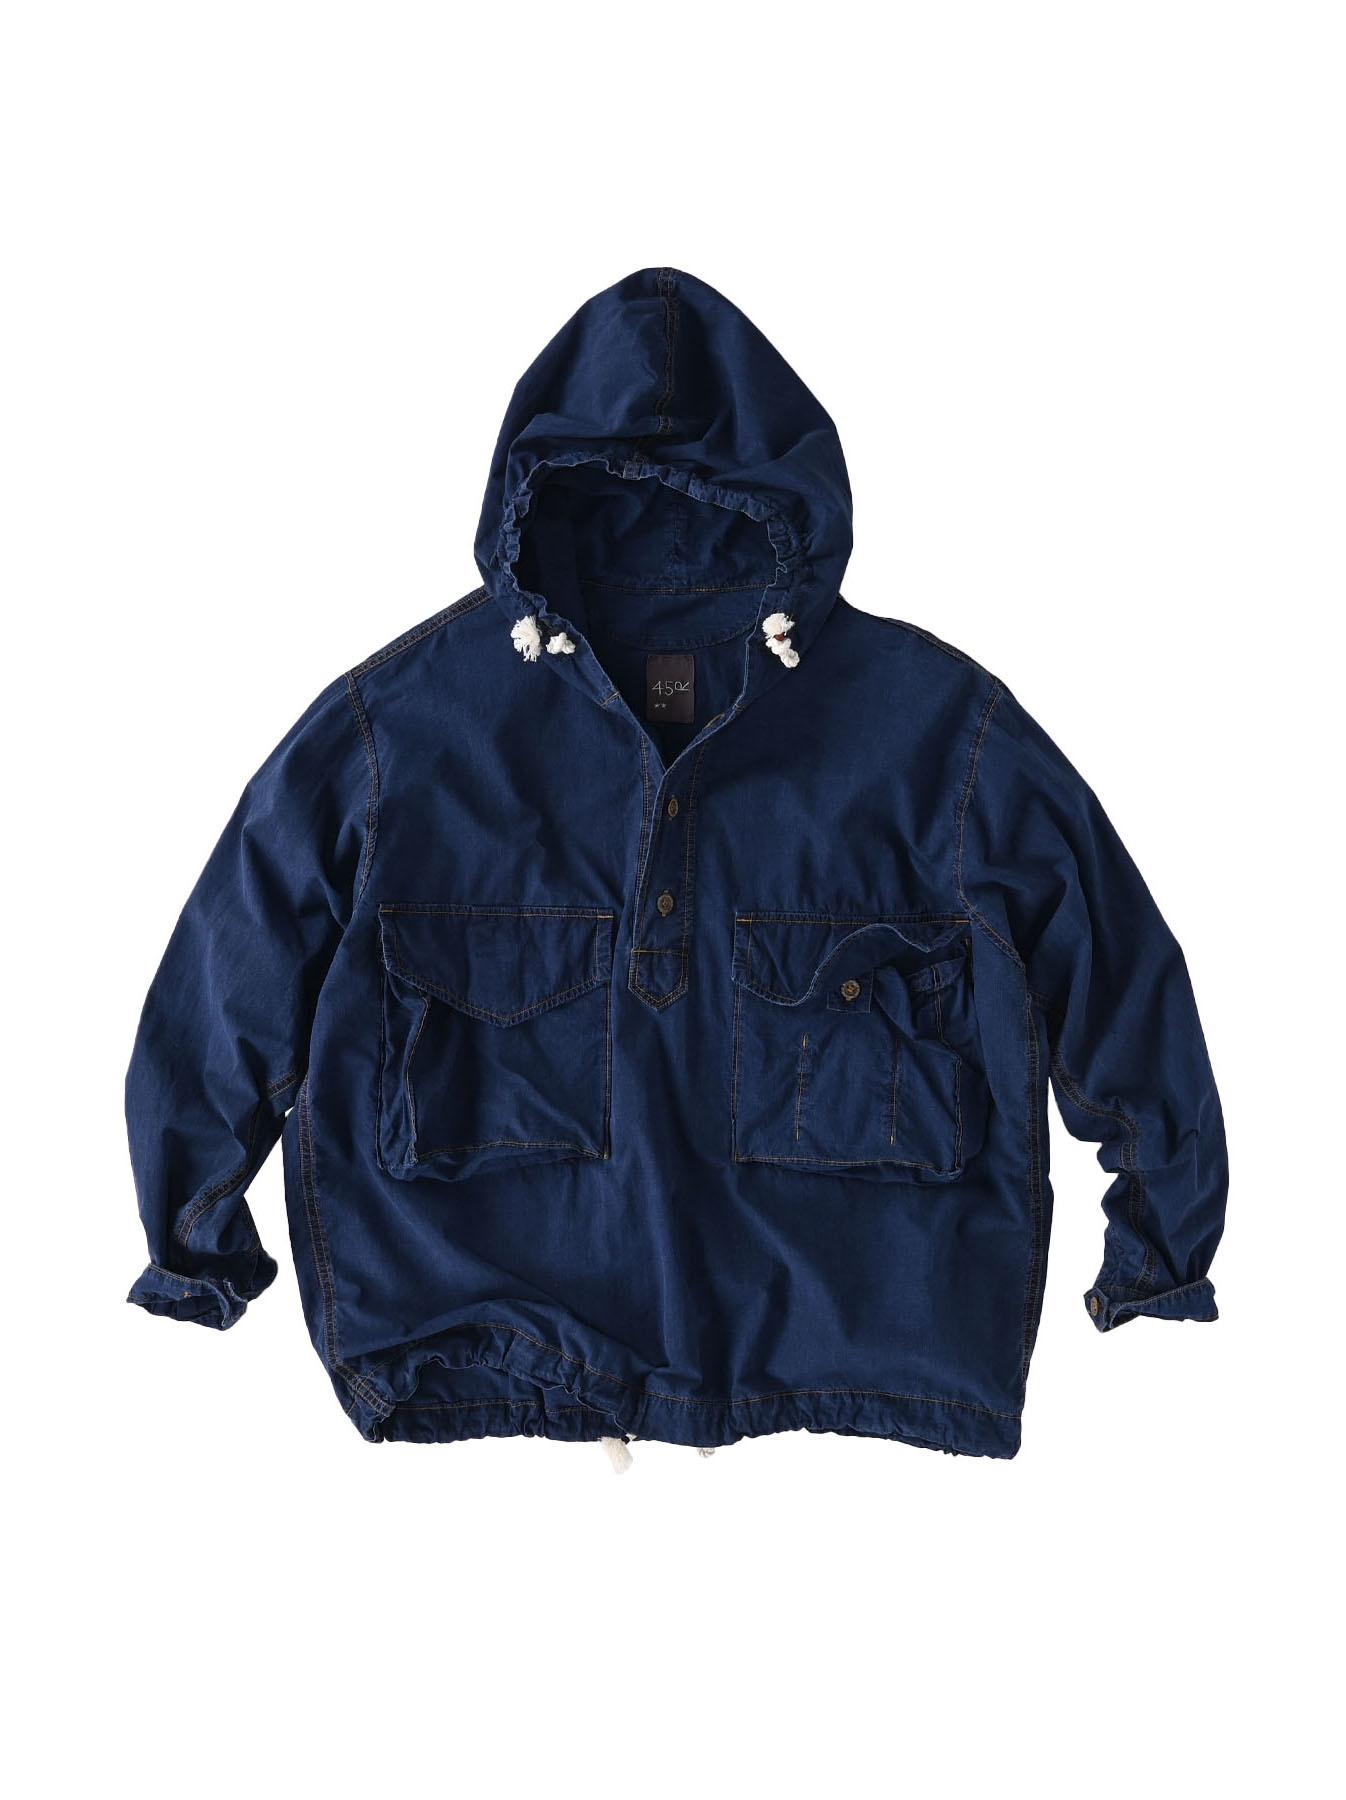 Indigo Tapet Damo Cotton On The Beach Hoodie Shirt-1